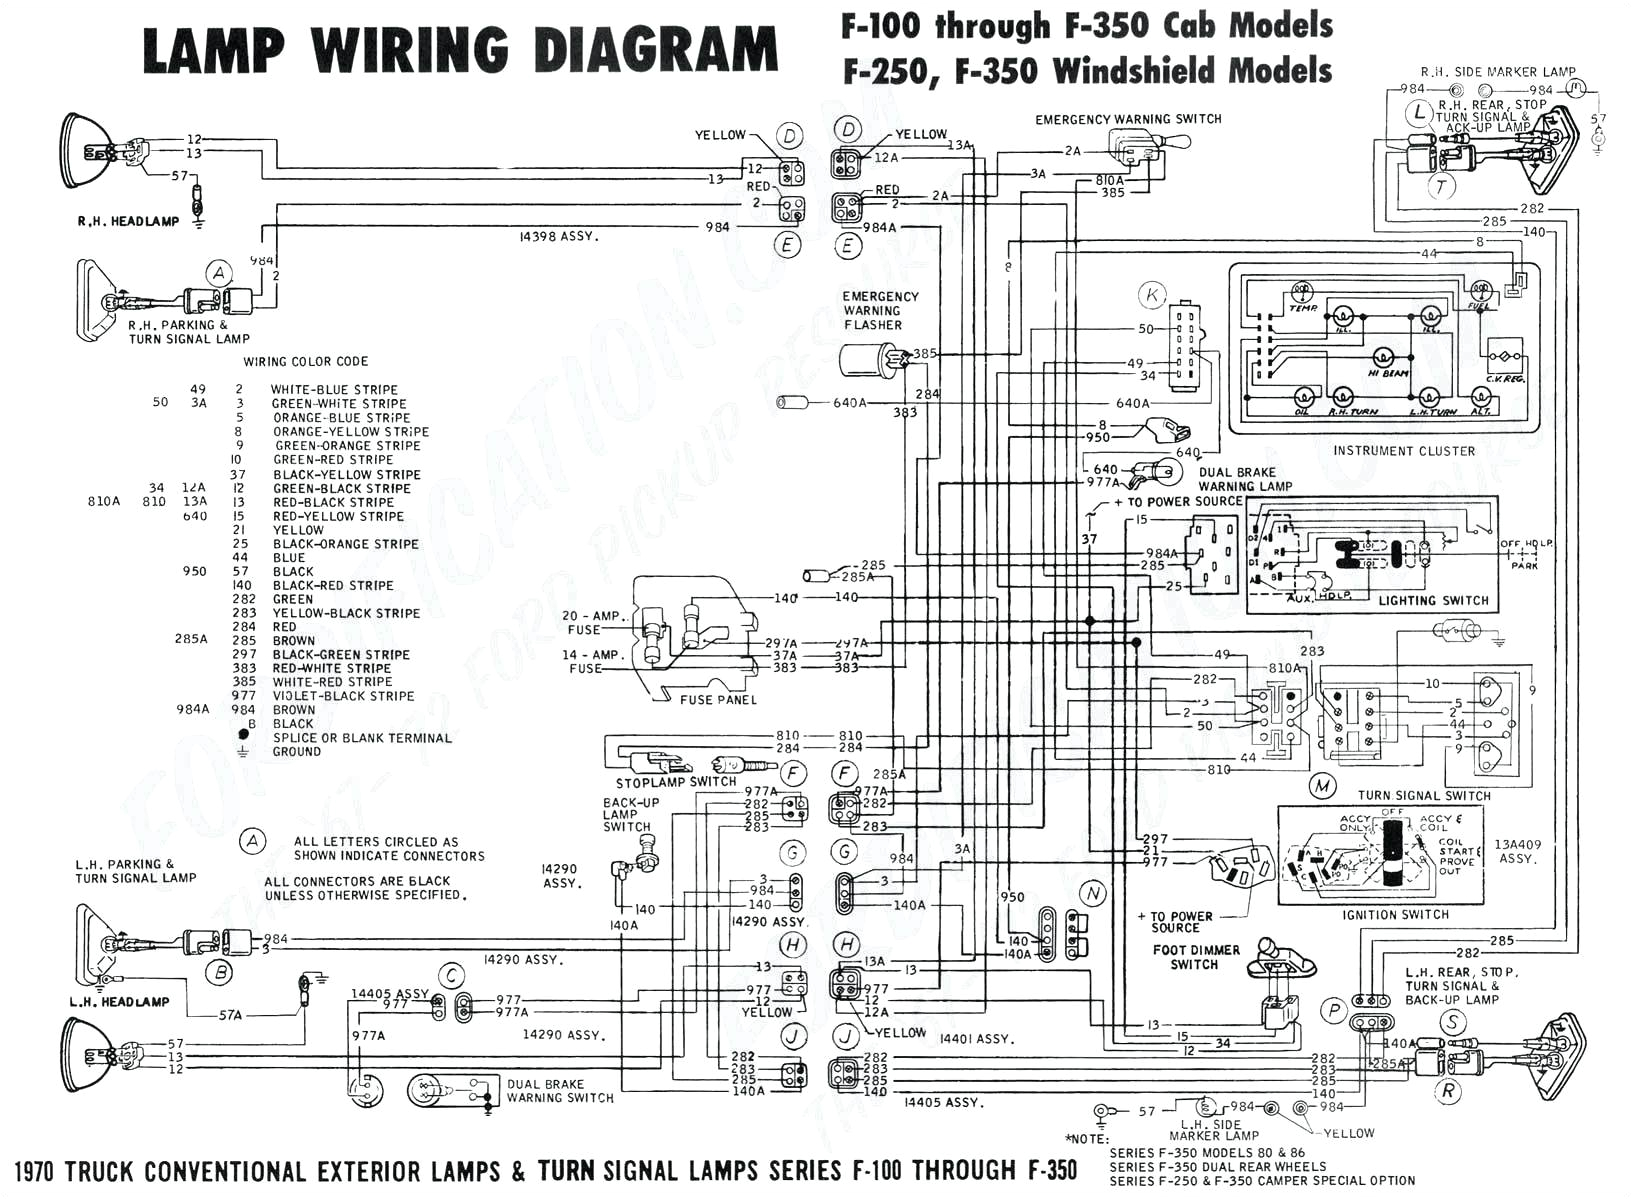 2008 chevy impala radio wiring diagram best of 2002 chevy impala wiring diagram lzk gallery wire